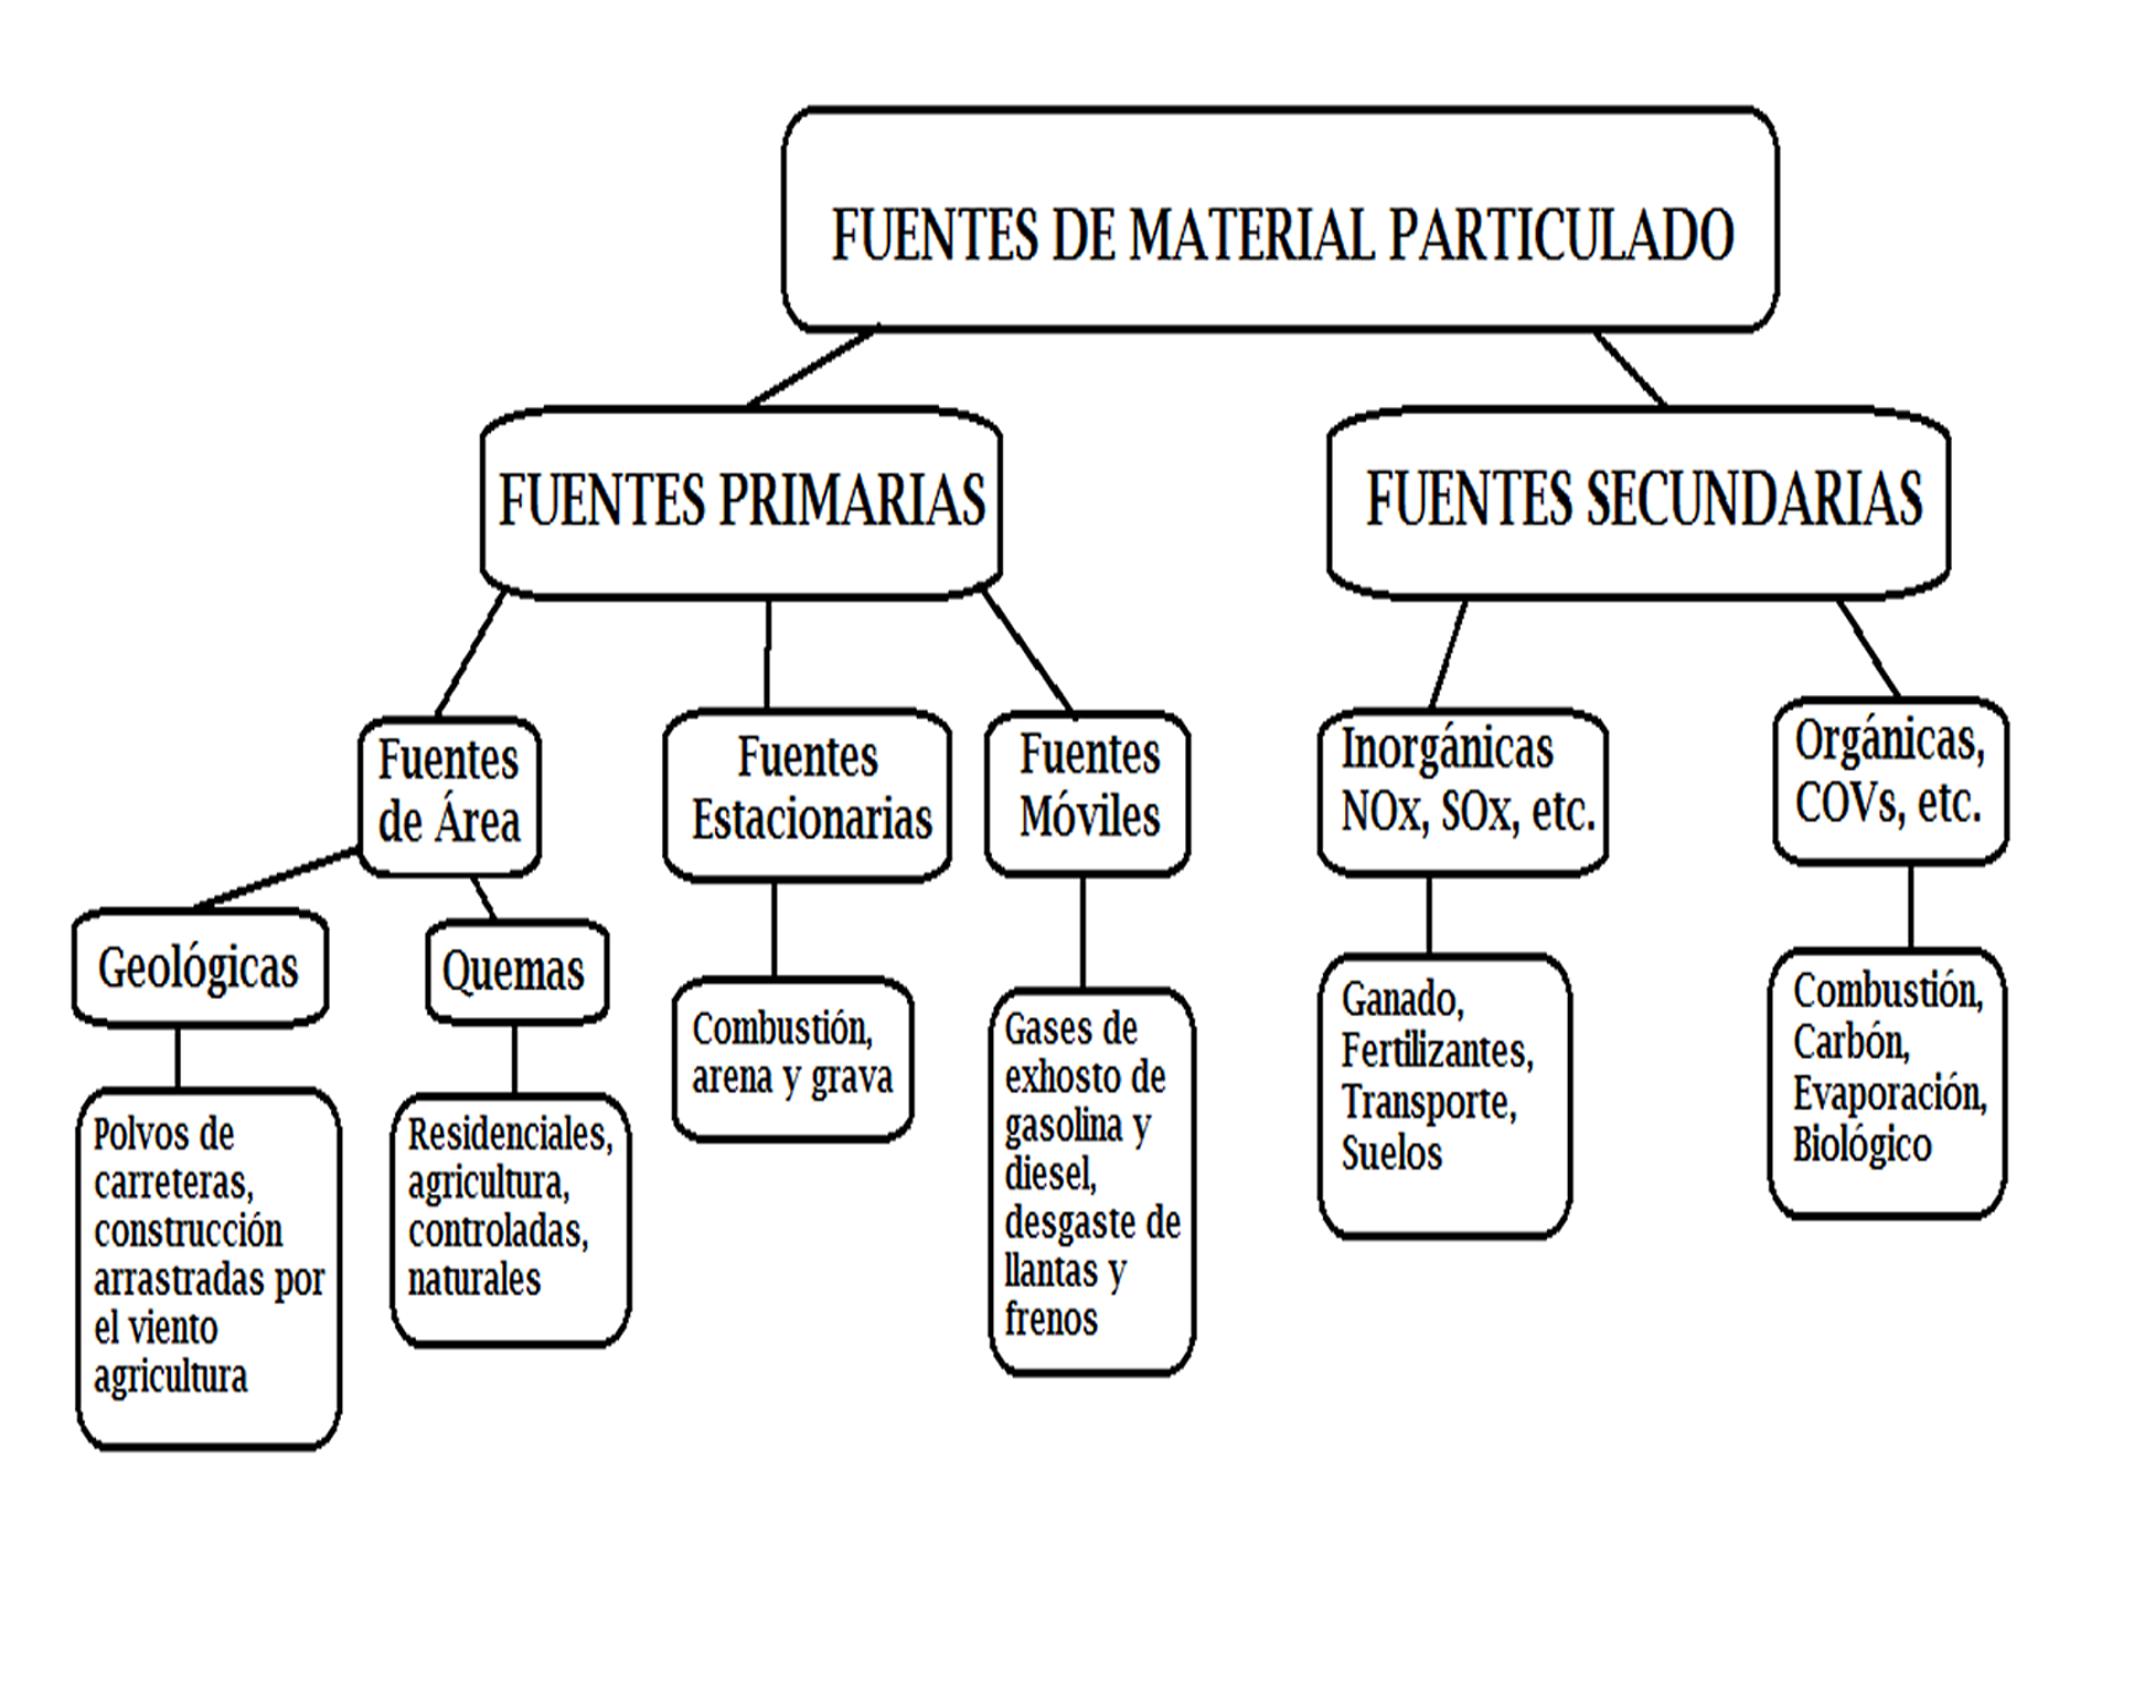 File:CLASIFICACION DE FUENTES DE PARTICULAS png - Wikimedia